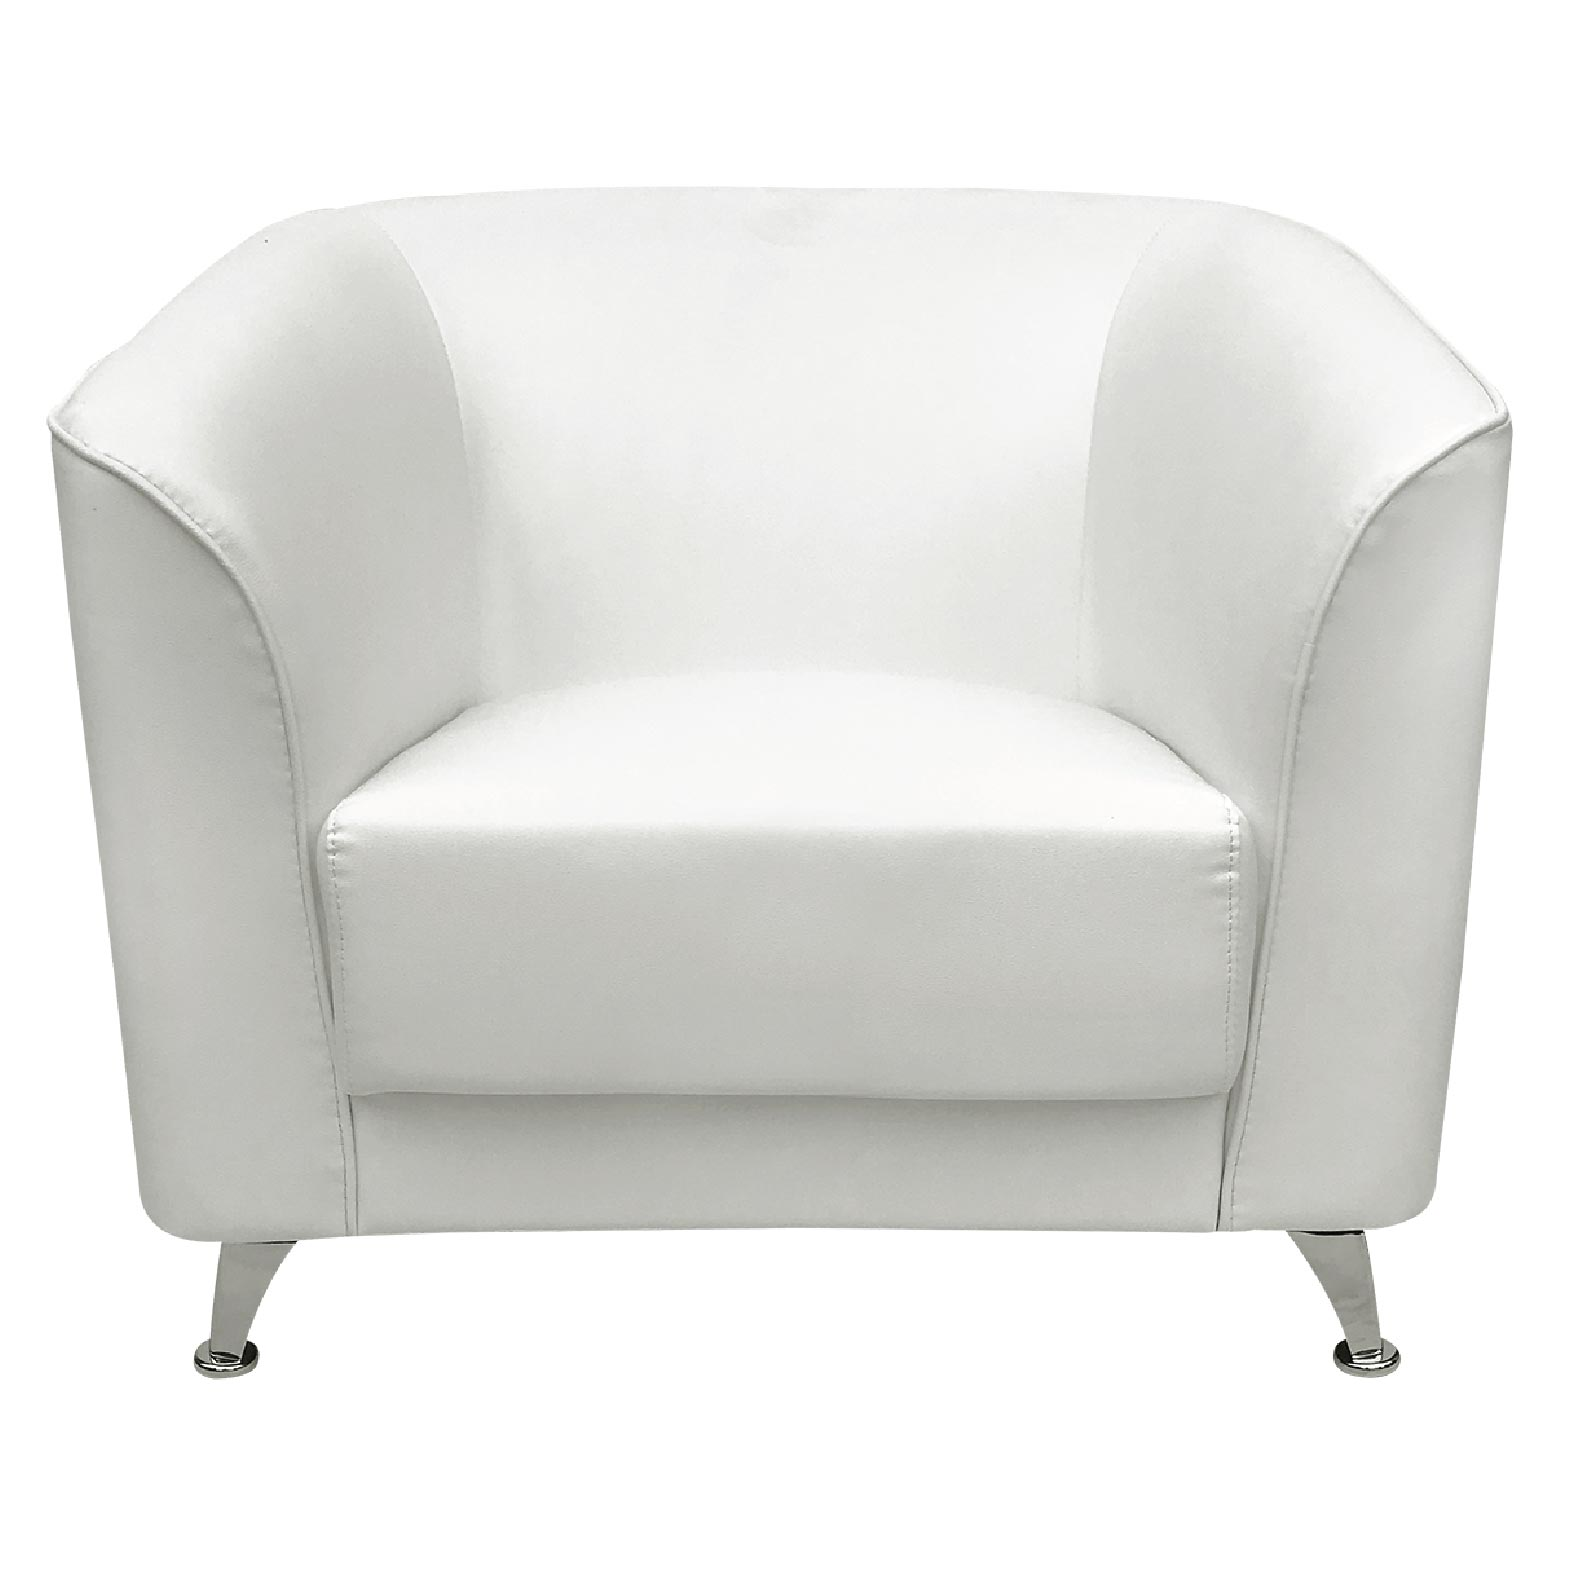 Charm Sofa Solo White